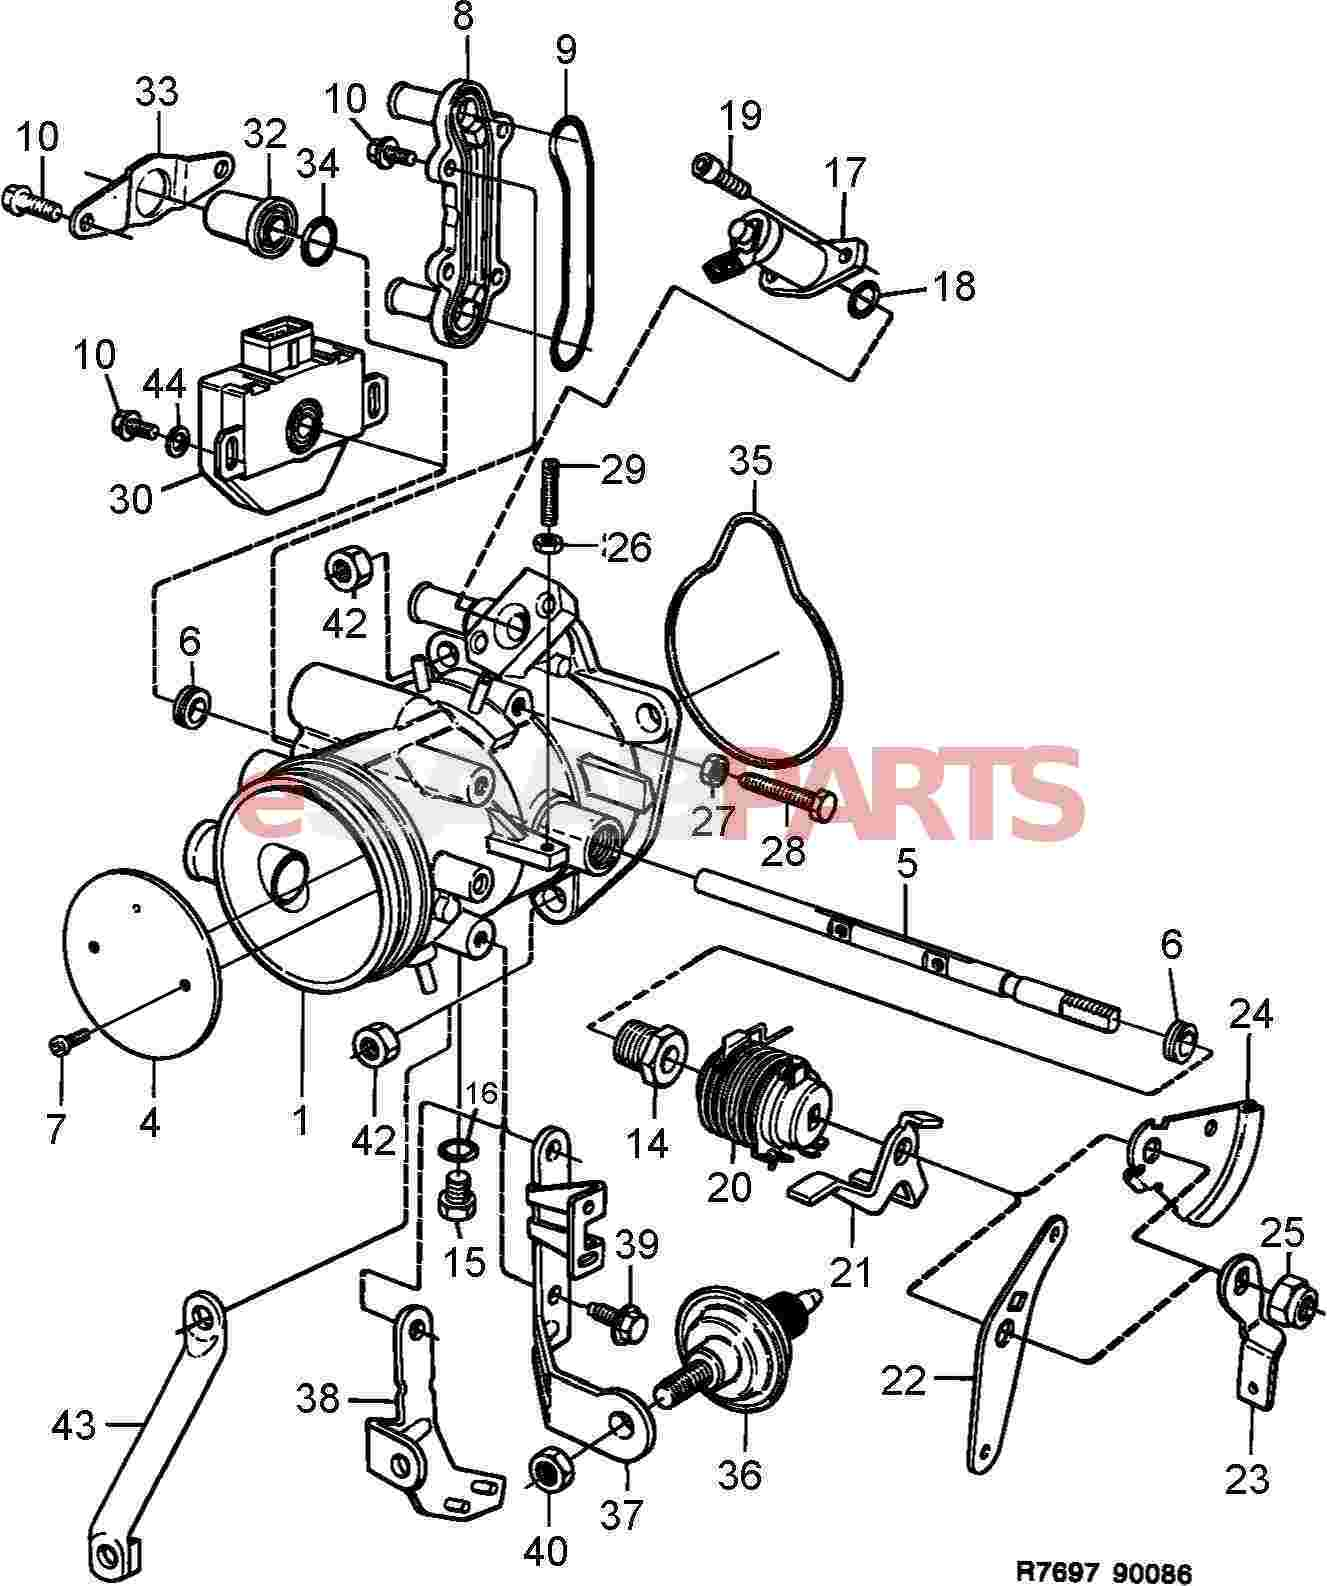 saab 900 parts diagram wiring diagrams